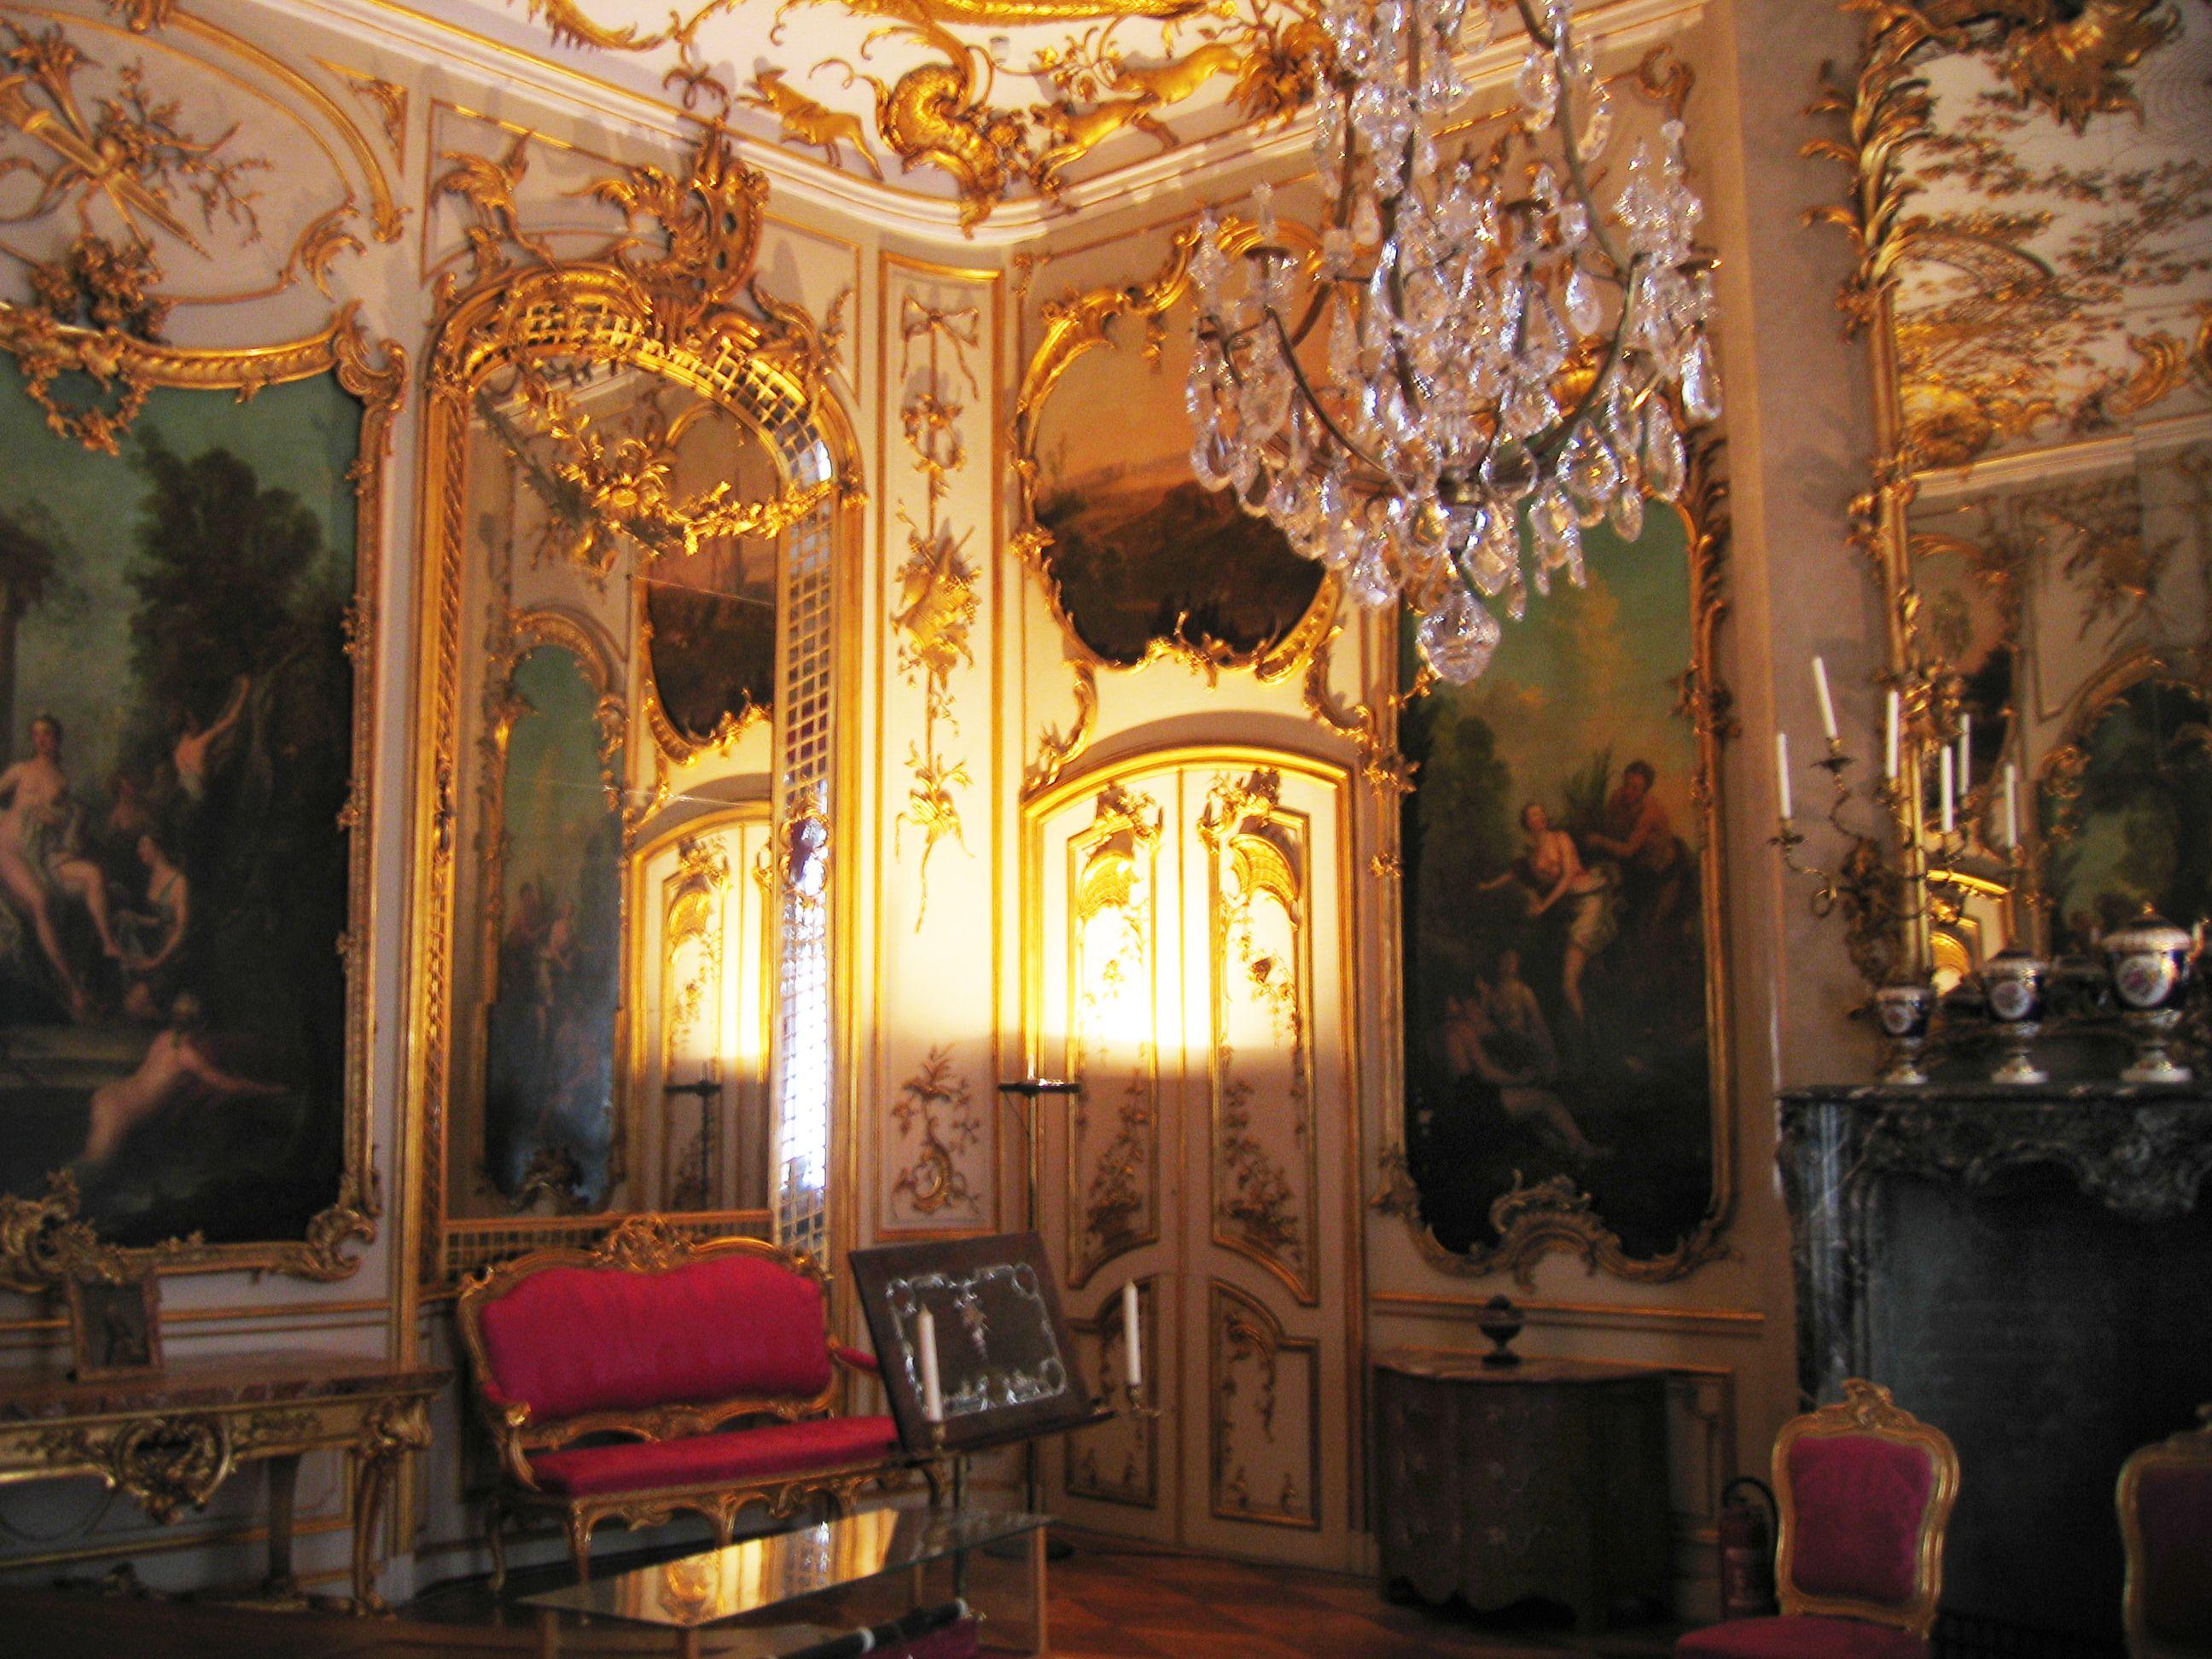 The rococo palace of king friedrich ii in potsdam germany for Designhotel potsdam